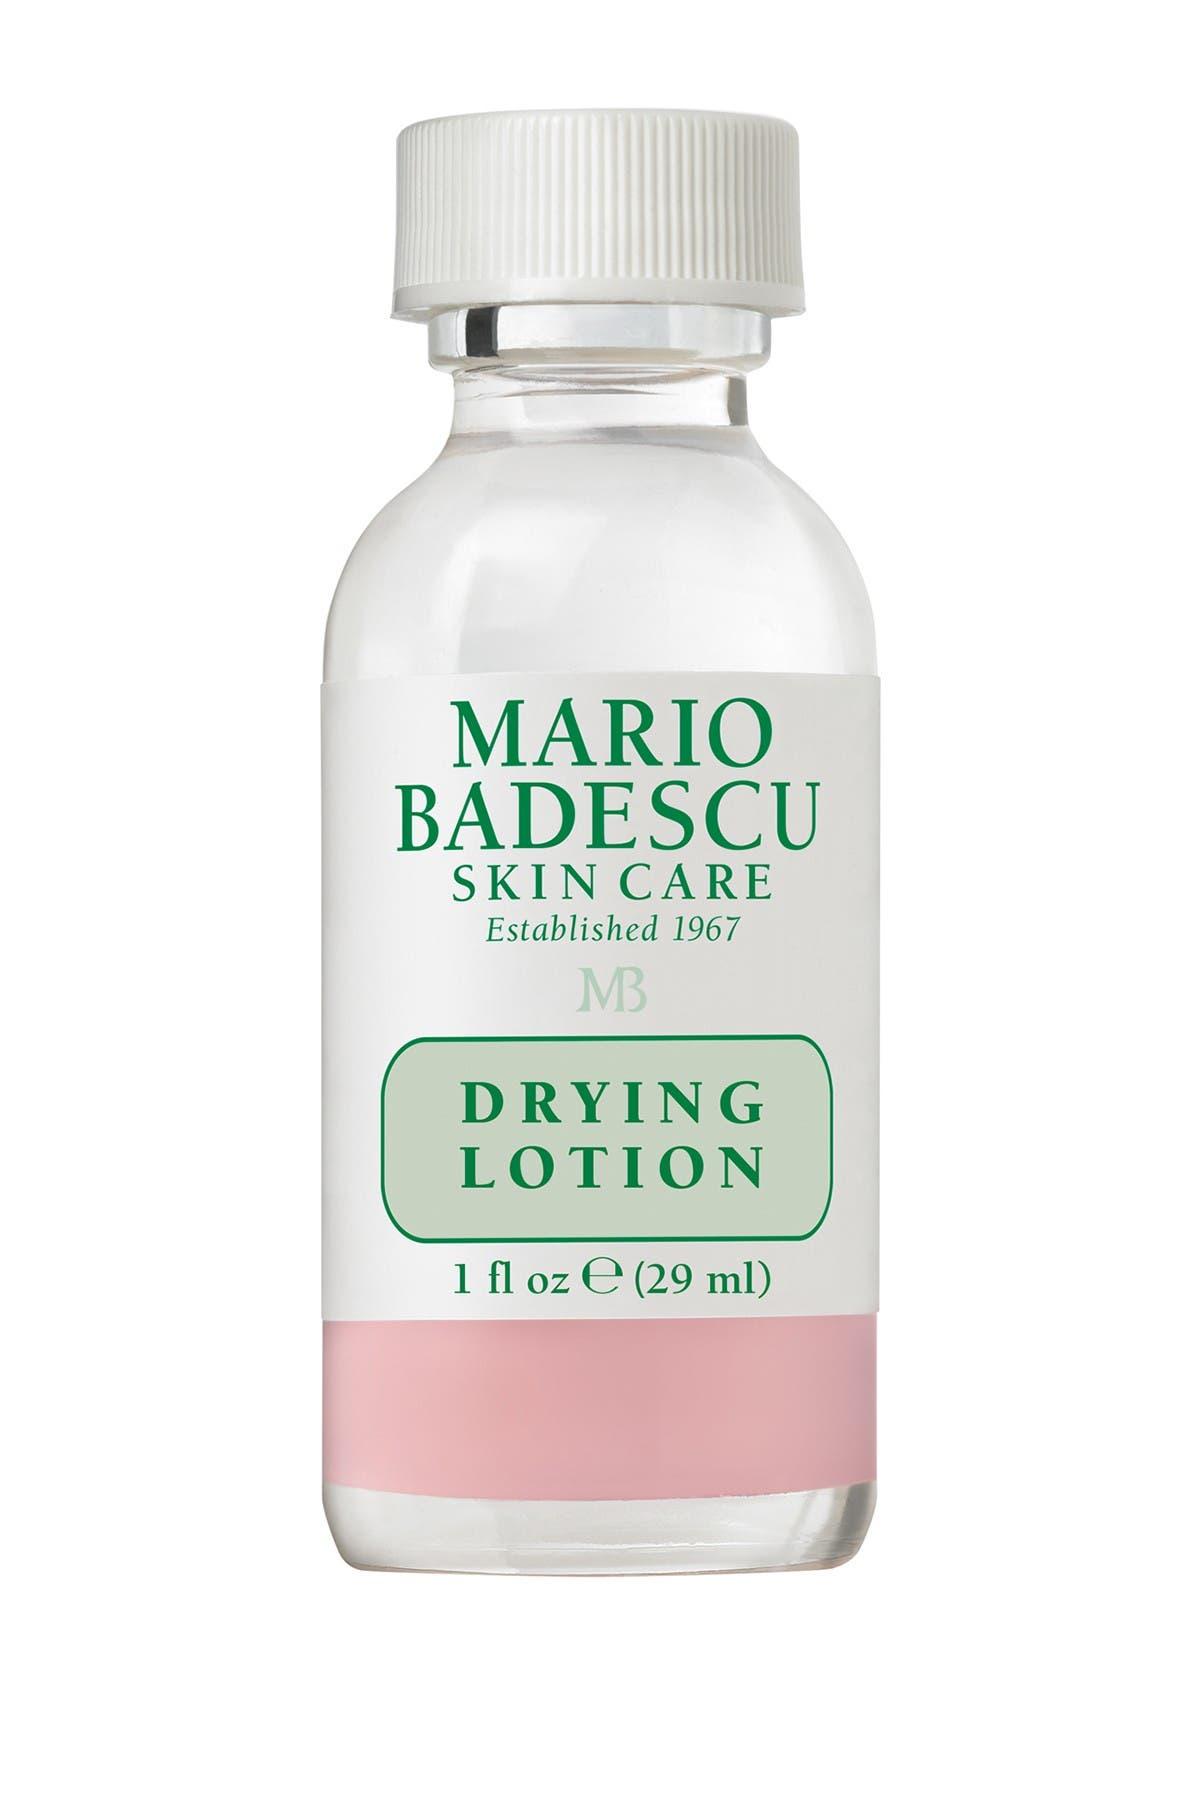 Image of Mario Badescu Drying Lotion - 1.0 oz. - Travel Size